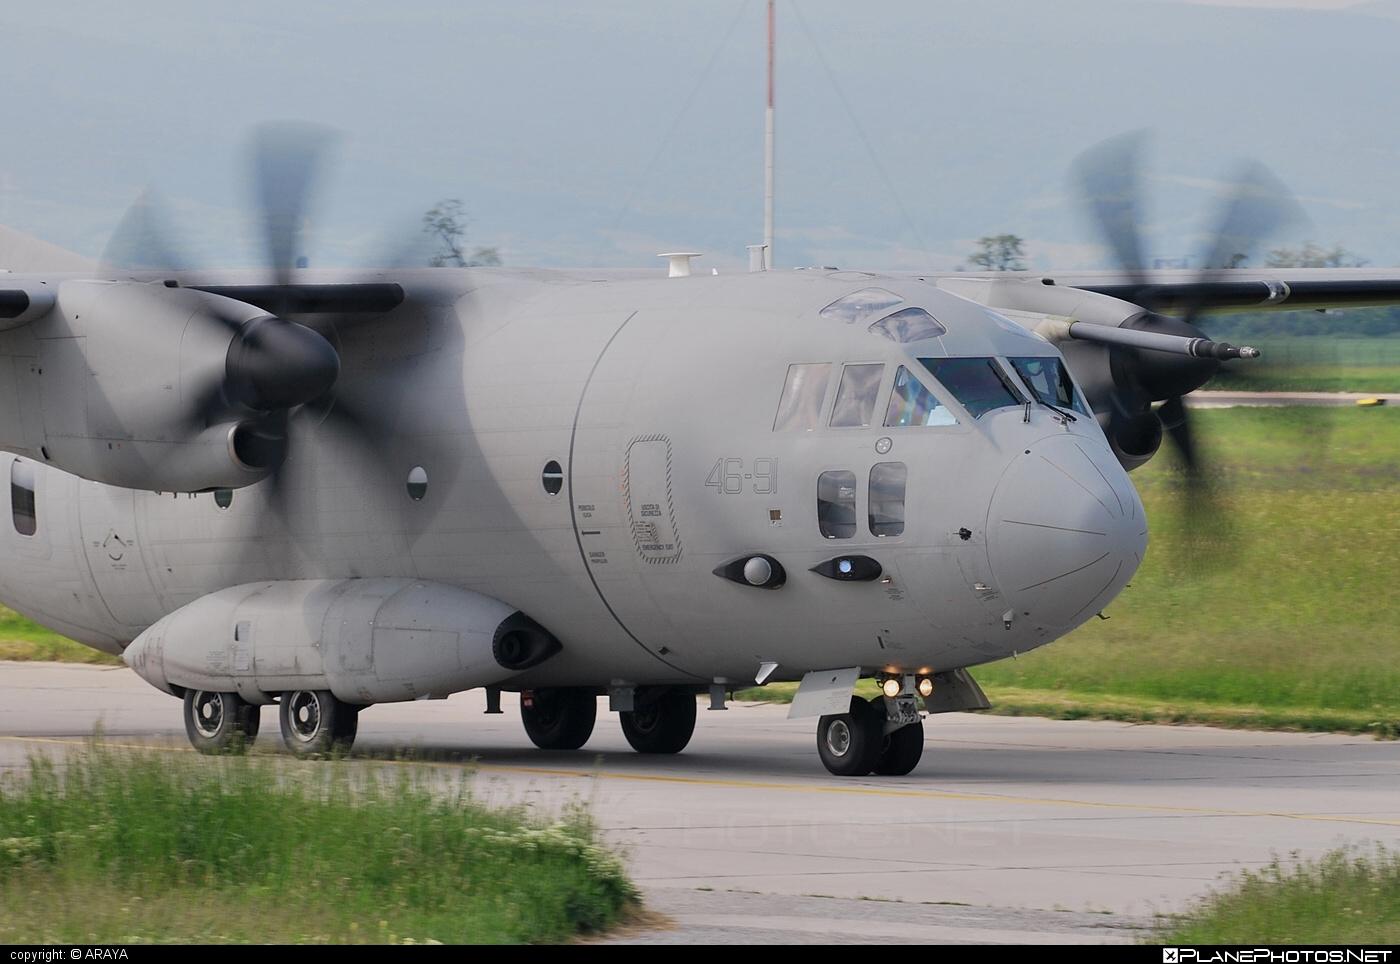 Alenia C-27J Spartan - MM62250 operated by Aeronautica Militare (Italian Air Force) #alenia #aleniac27j #aleniac27jspartan #aleniaspartan #c27j #c27jspartan #c27spartan